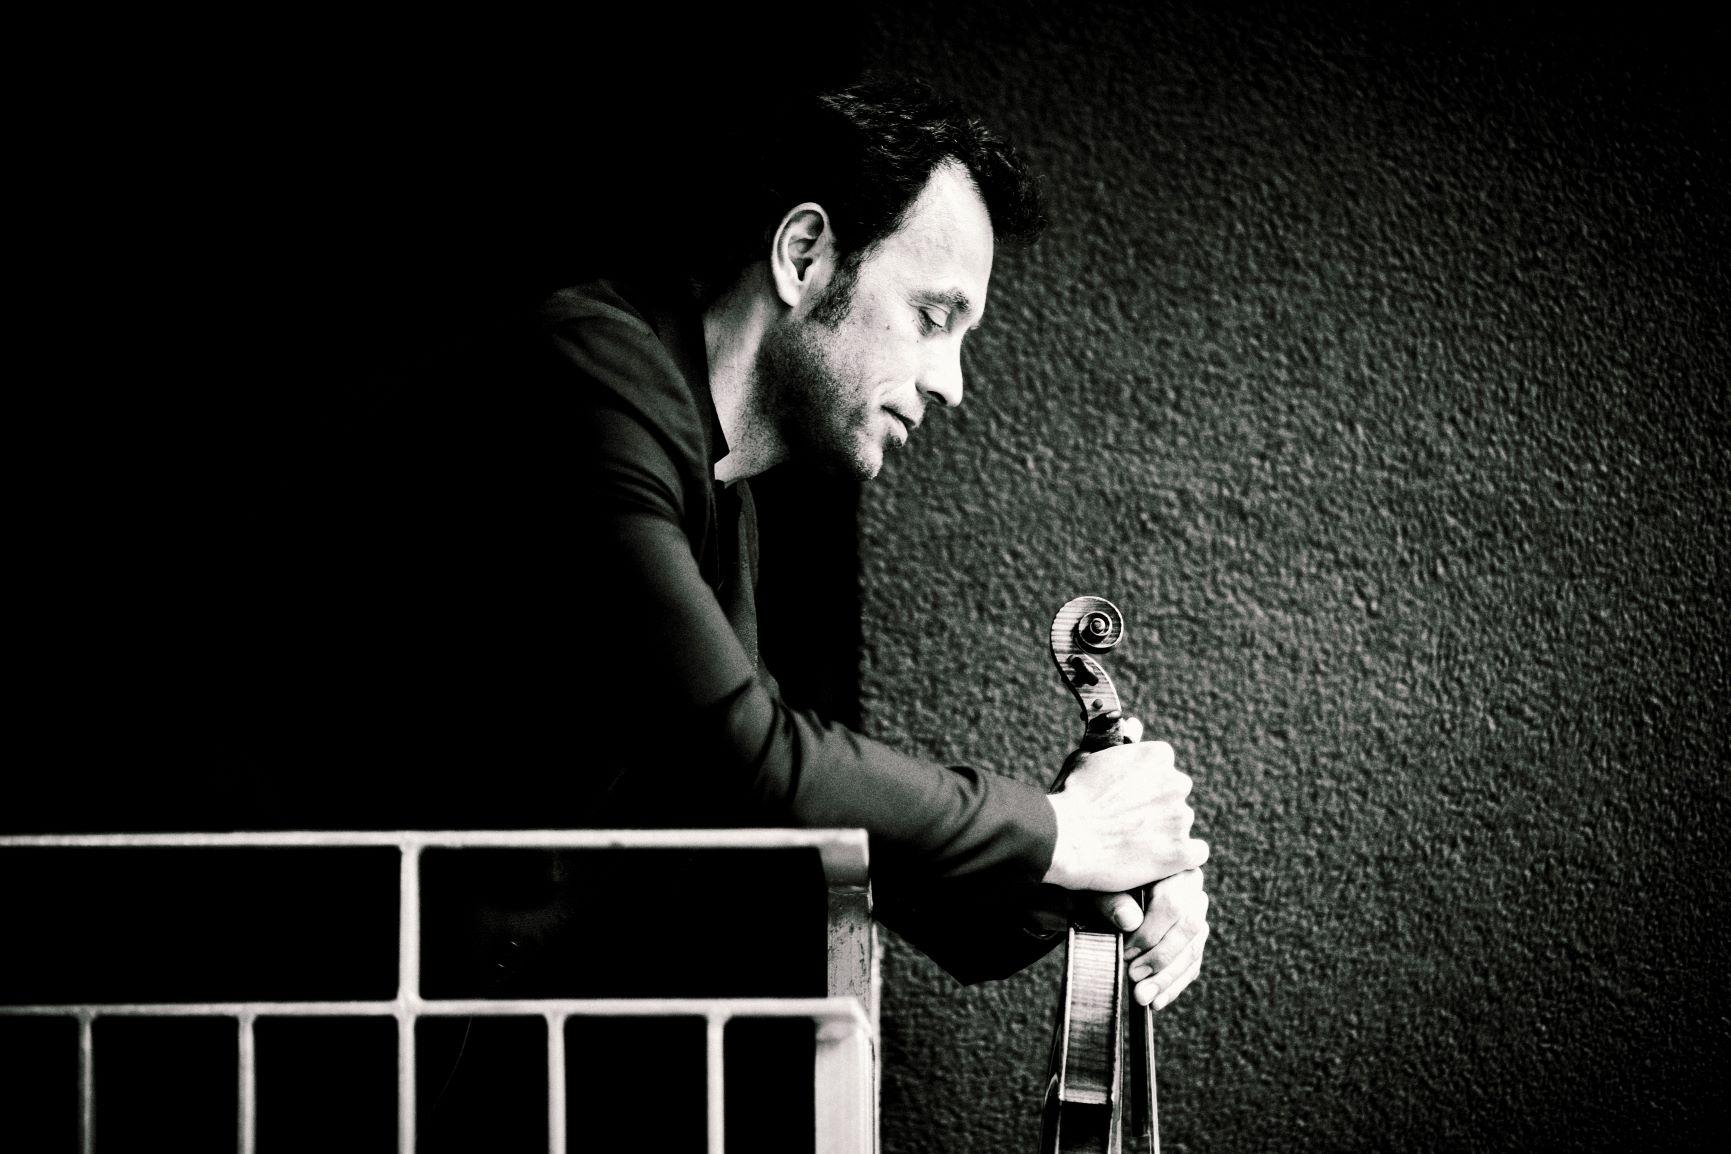 Musique / Caminandu